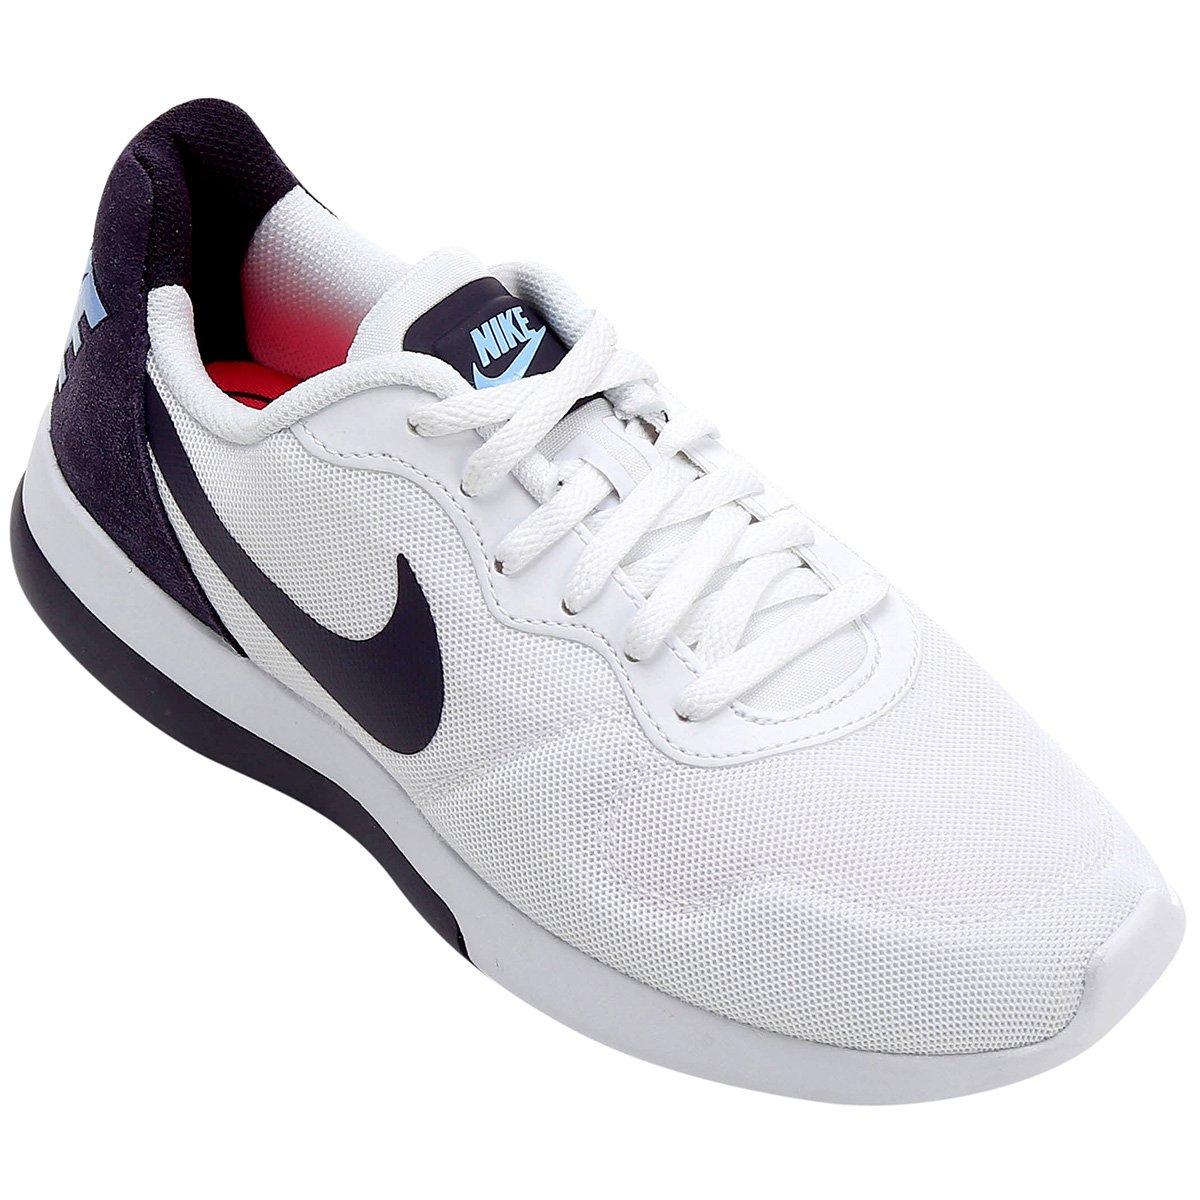 Tênis Nike Md Runner 2 Lw - Compre Agora  76dbaa0fcd56b